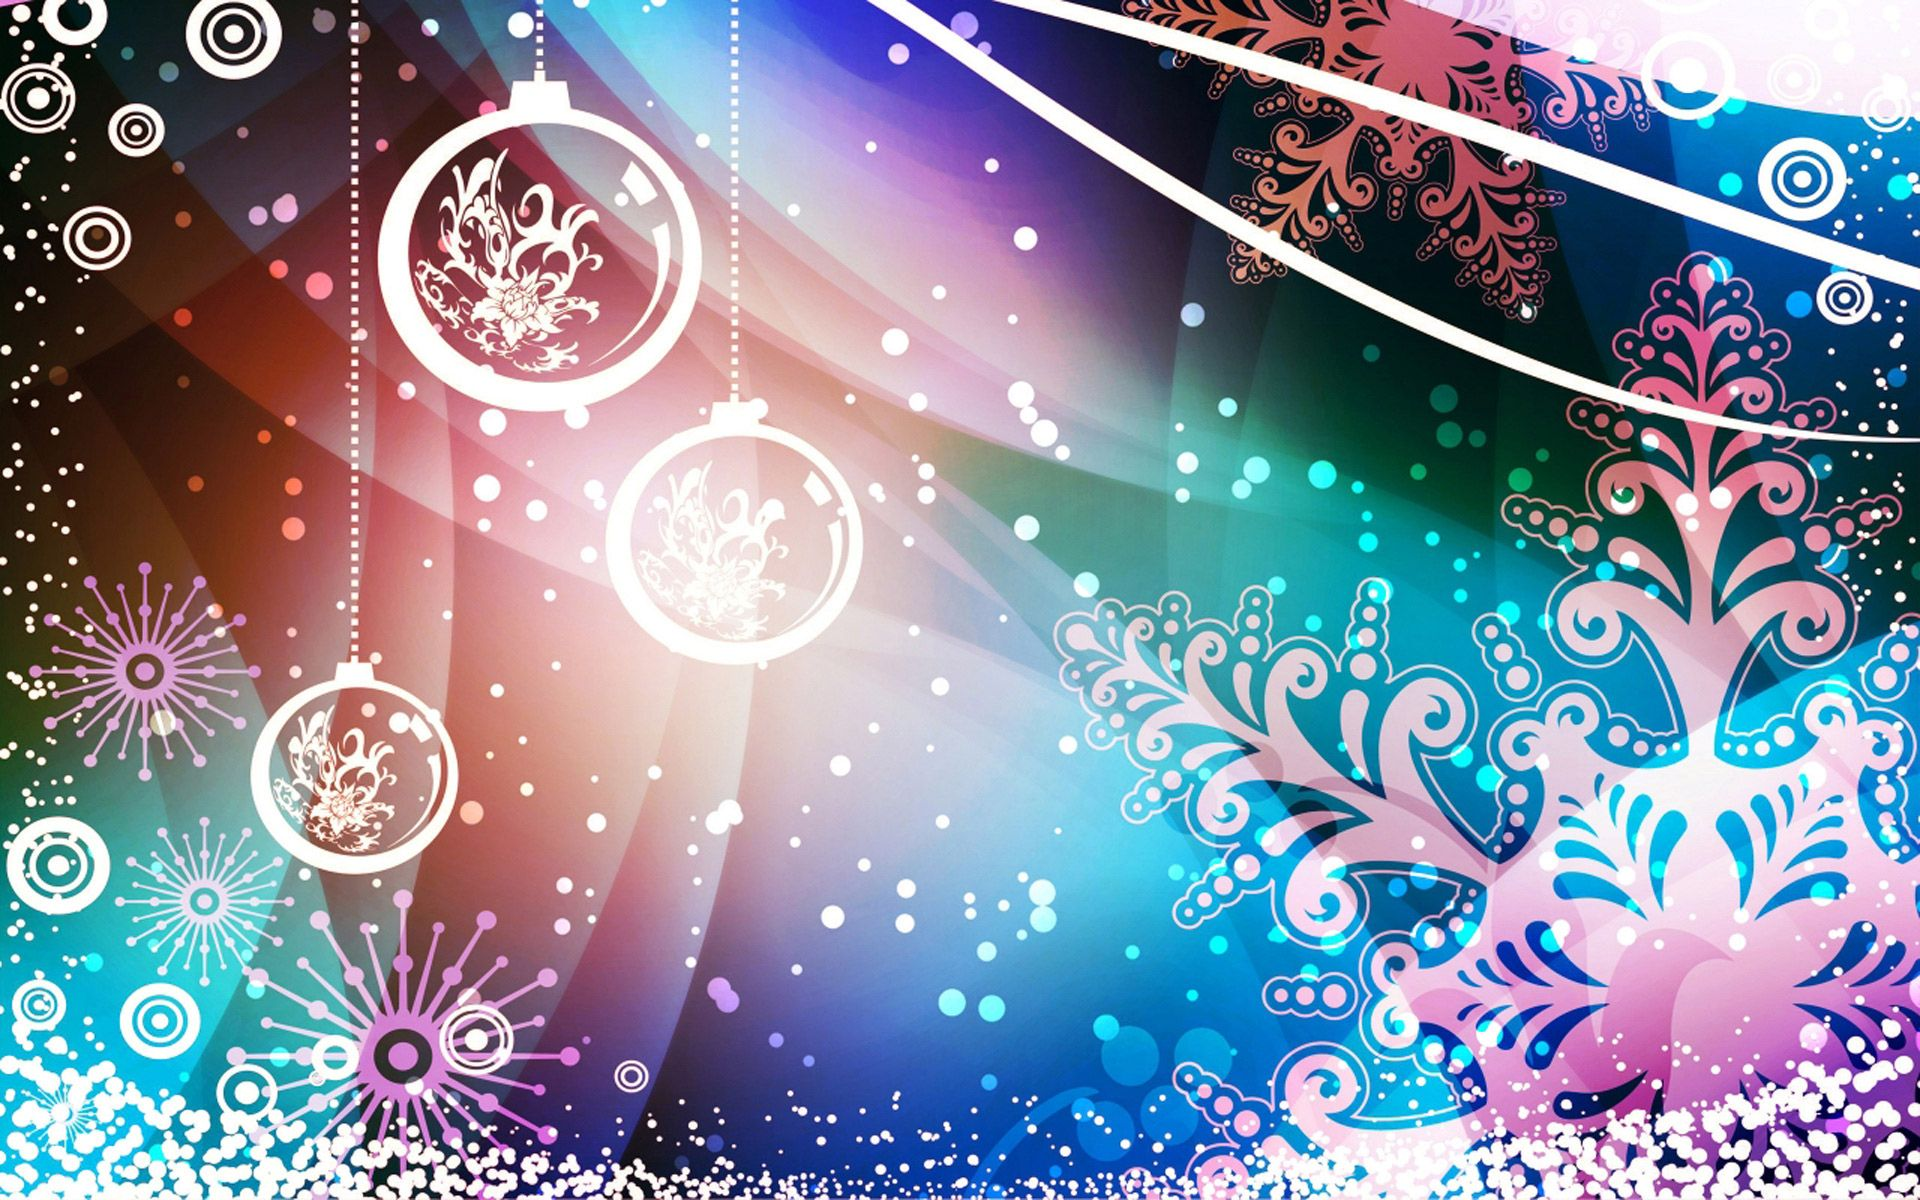 Christmas Backgrounds Free Beautifull Christmas Background Computer De Christmas Wallpaper Backgrounds Christmas Desktop Wallpaper Christmas Wallpaper Free